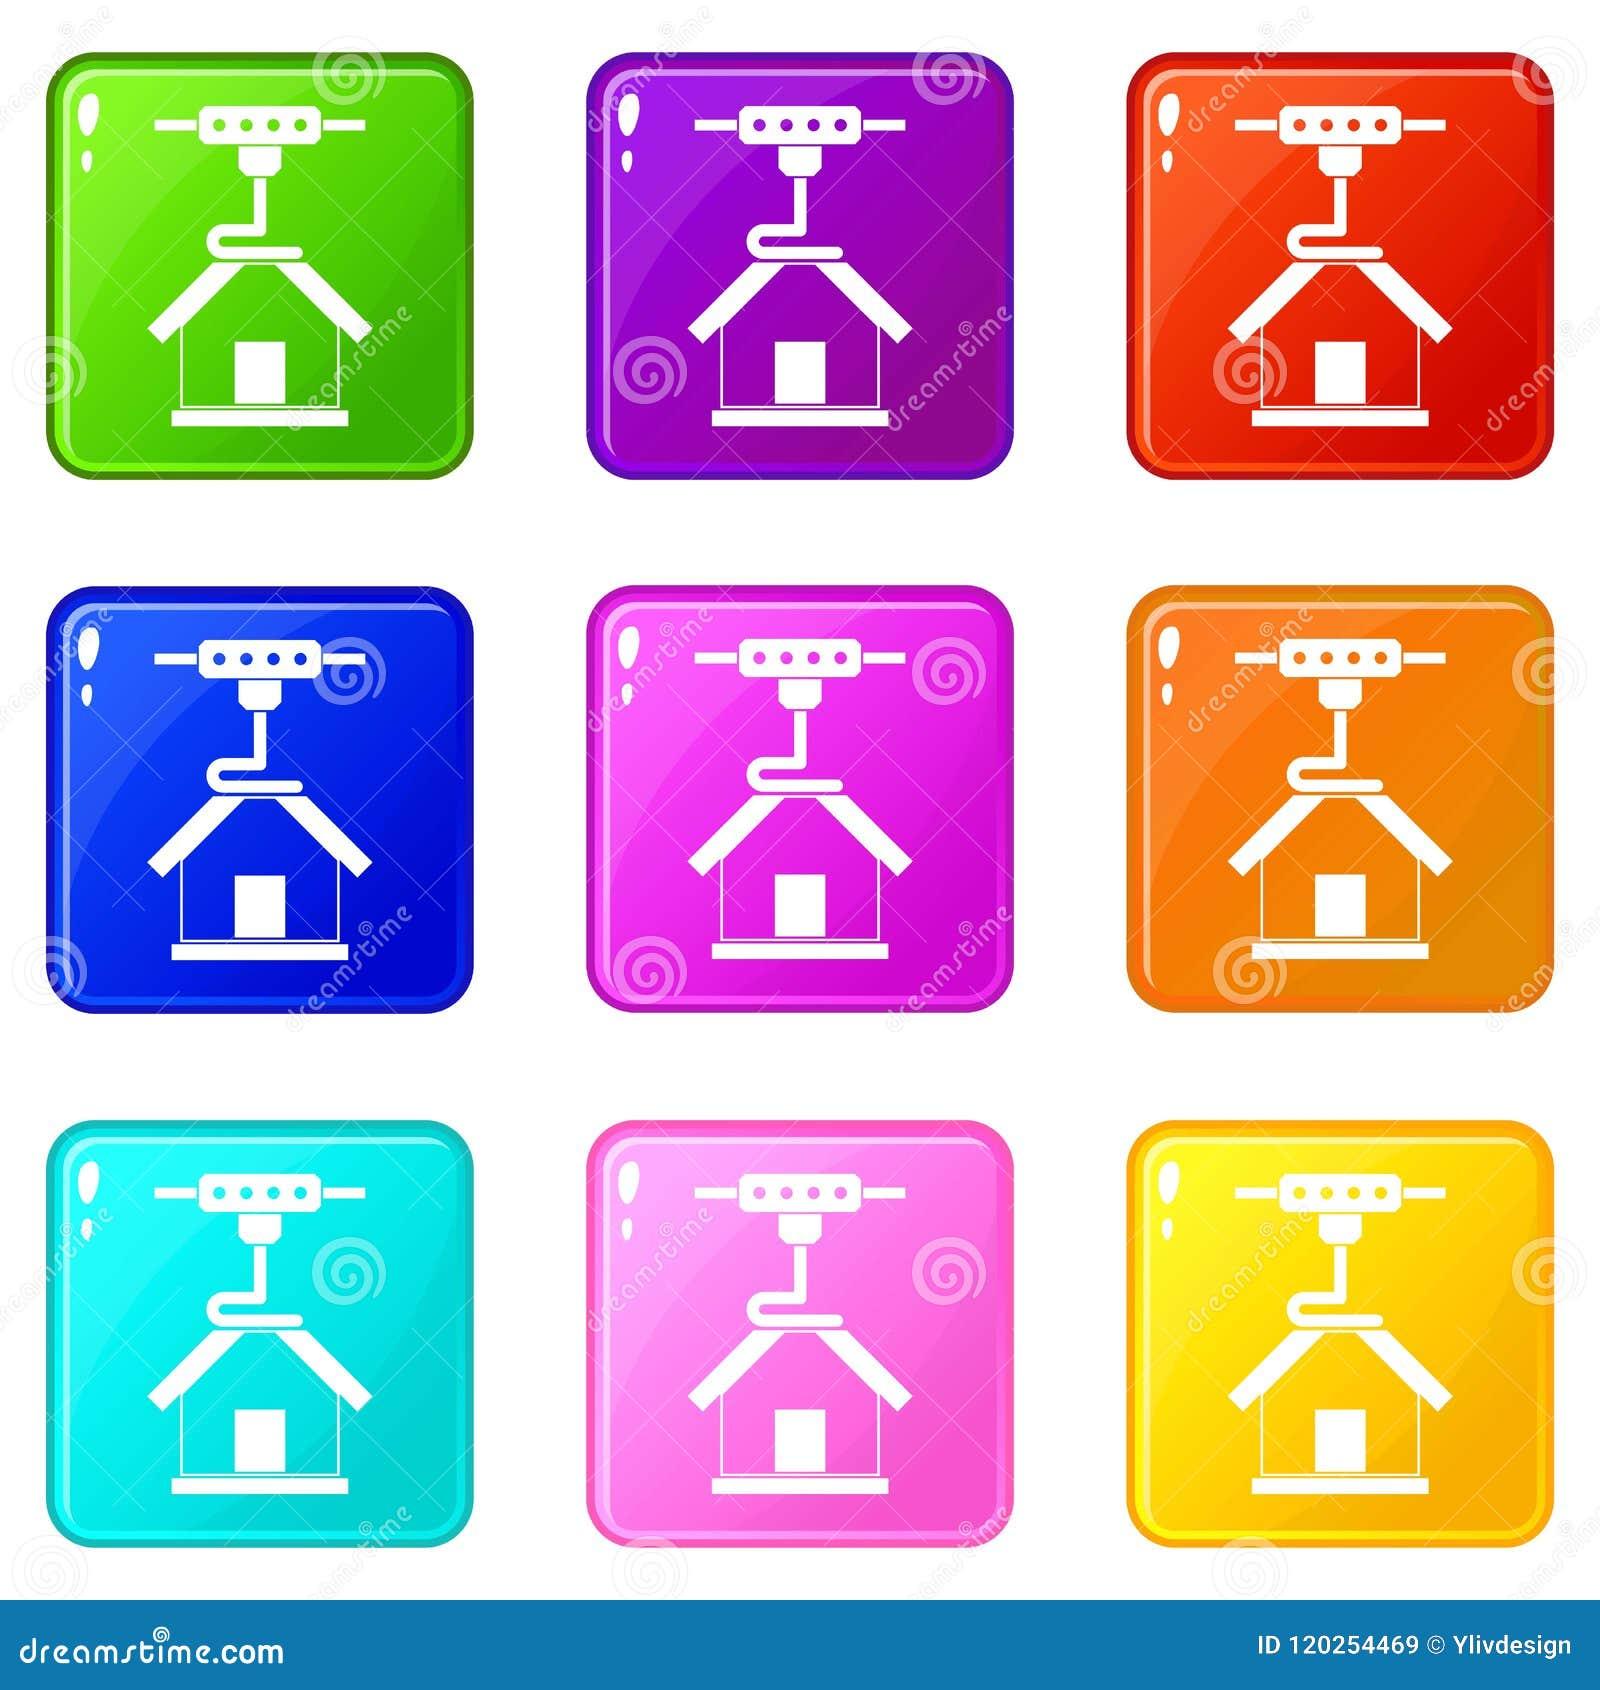 3d Printer Printing House Set 9 Stock Vector - Illustration of ...